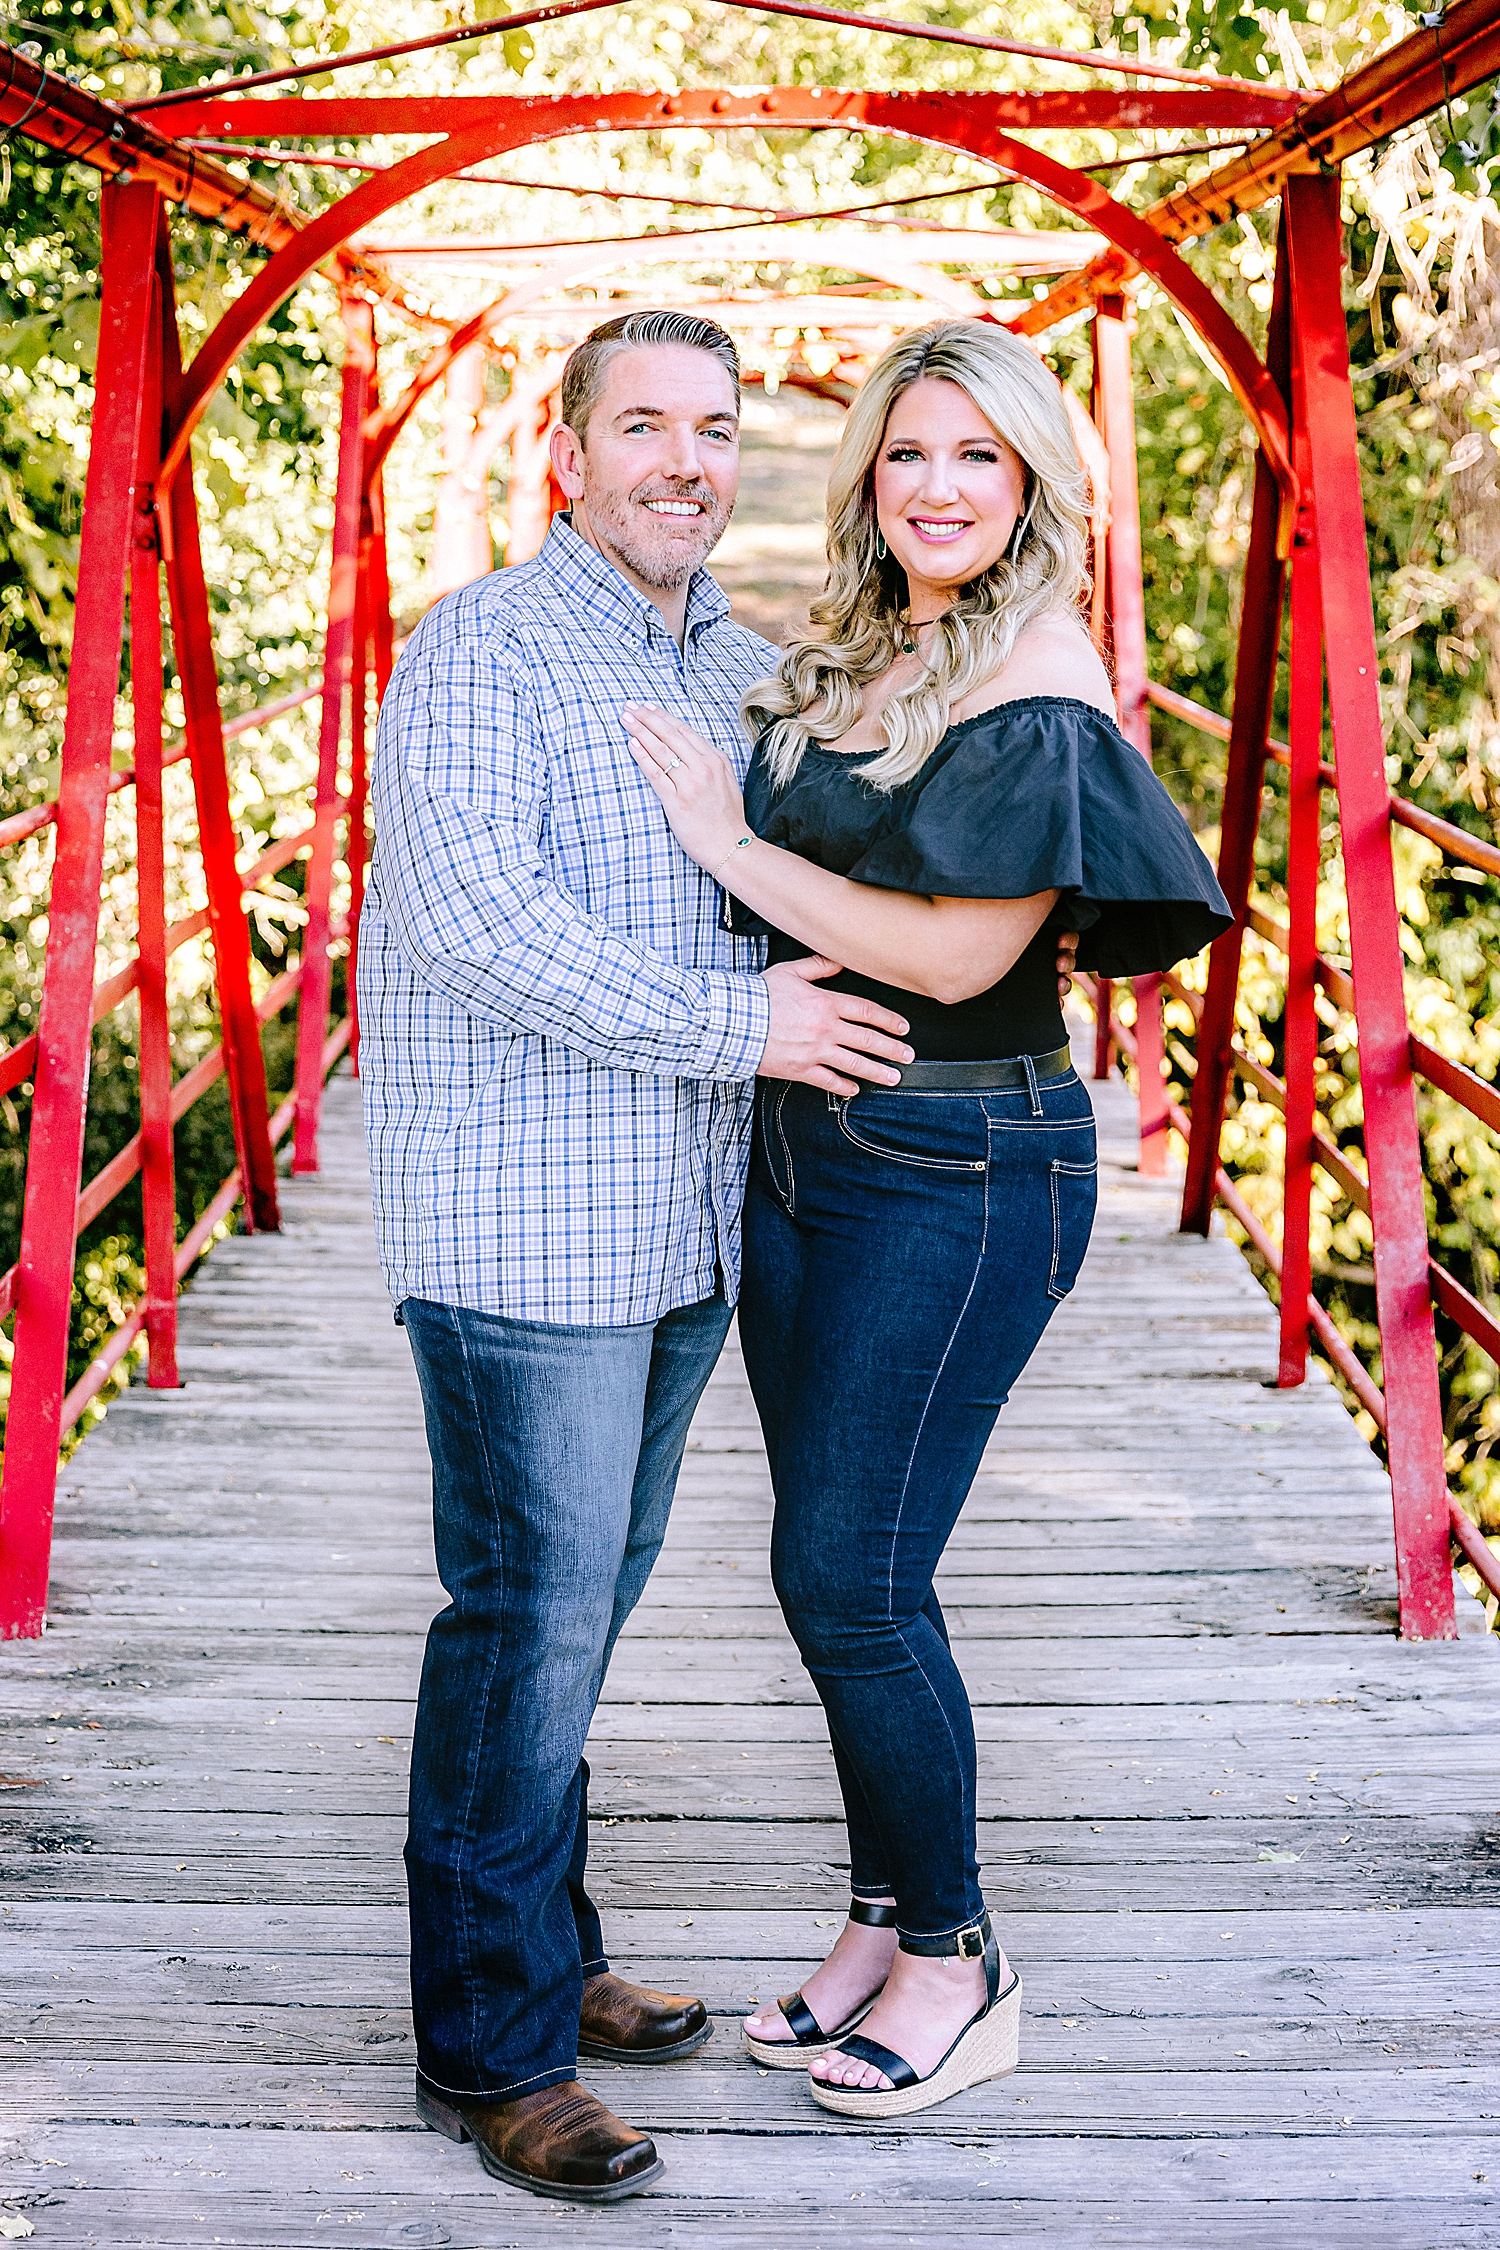 Engagement-Photo-Session-University-of-Incarnate-Word-UIW-San-Antonio-Texas-Carly-Barton-Photography_0035.jpg